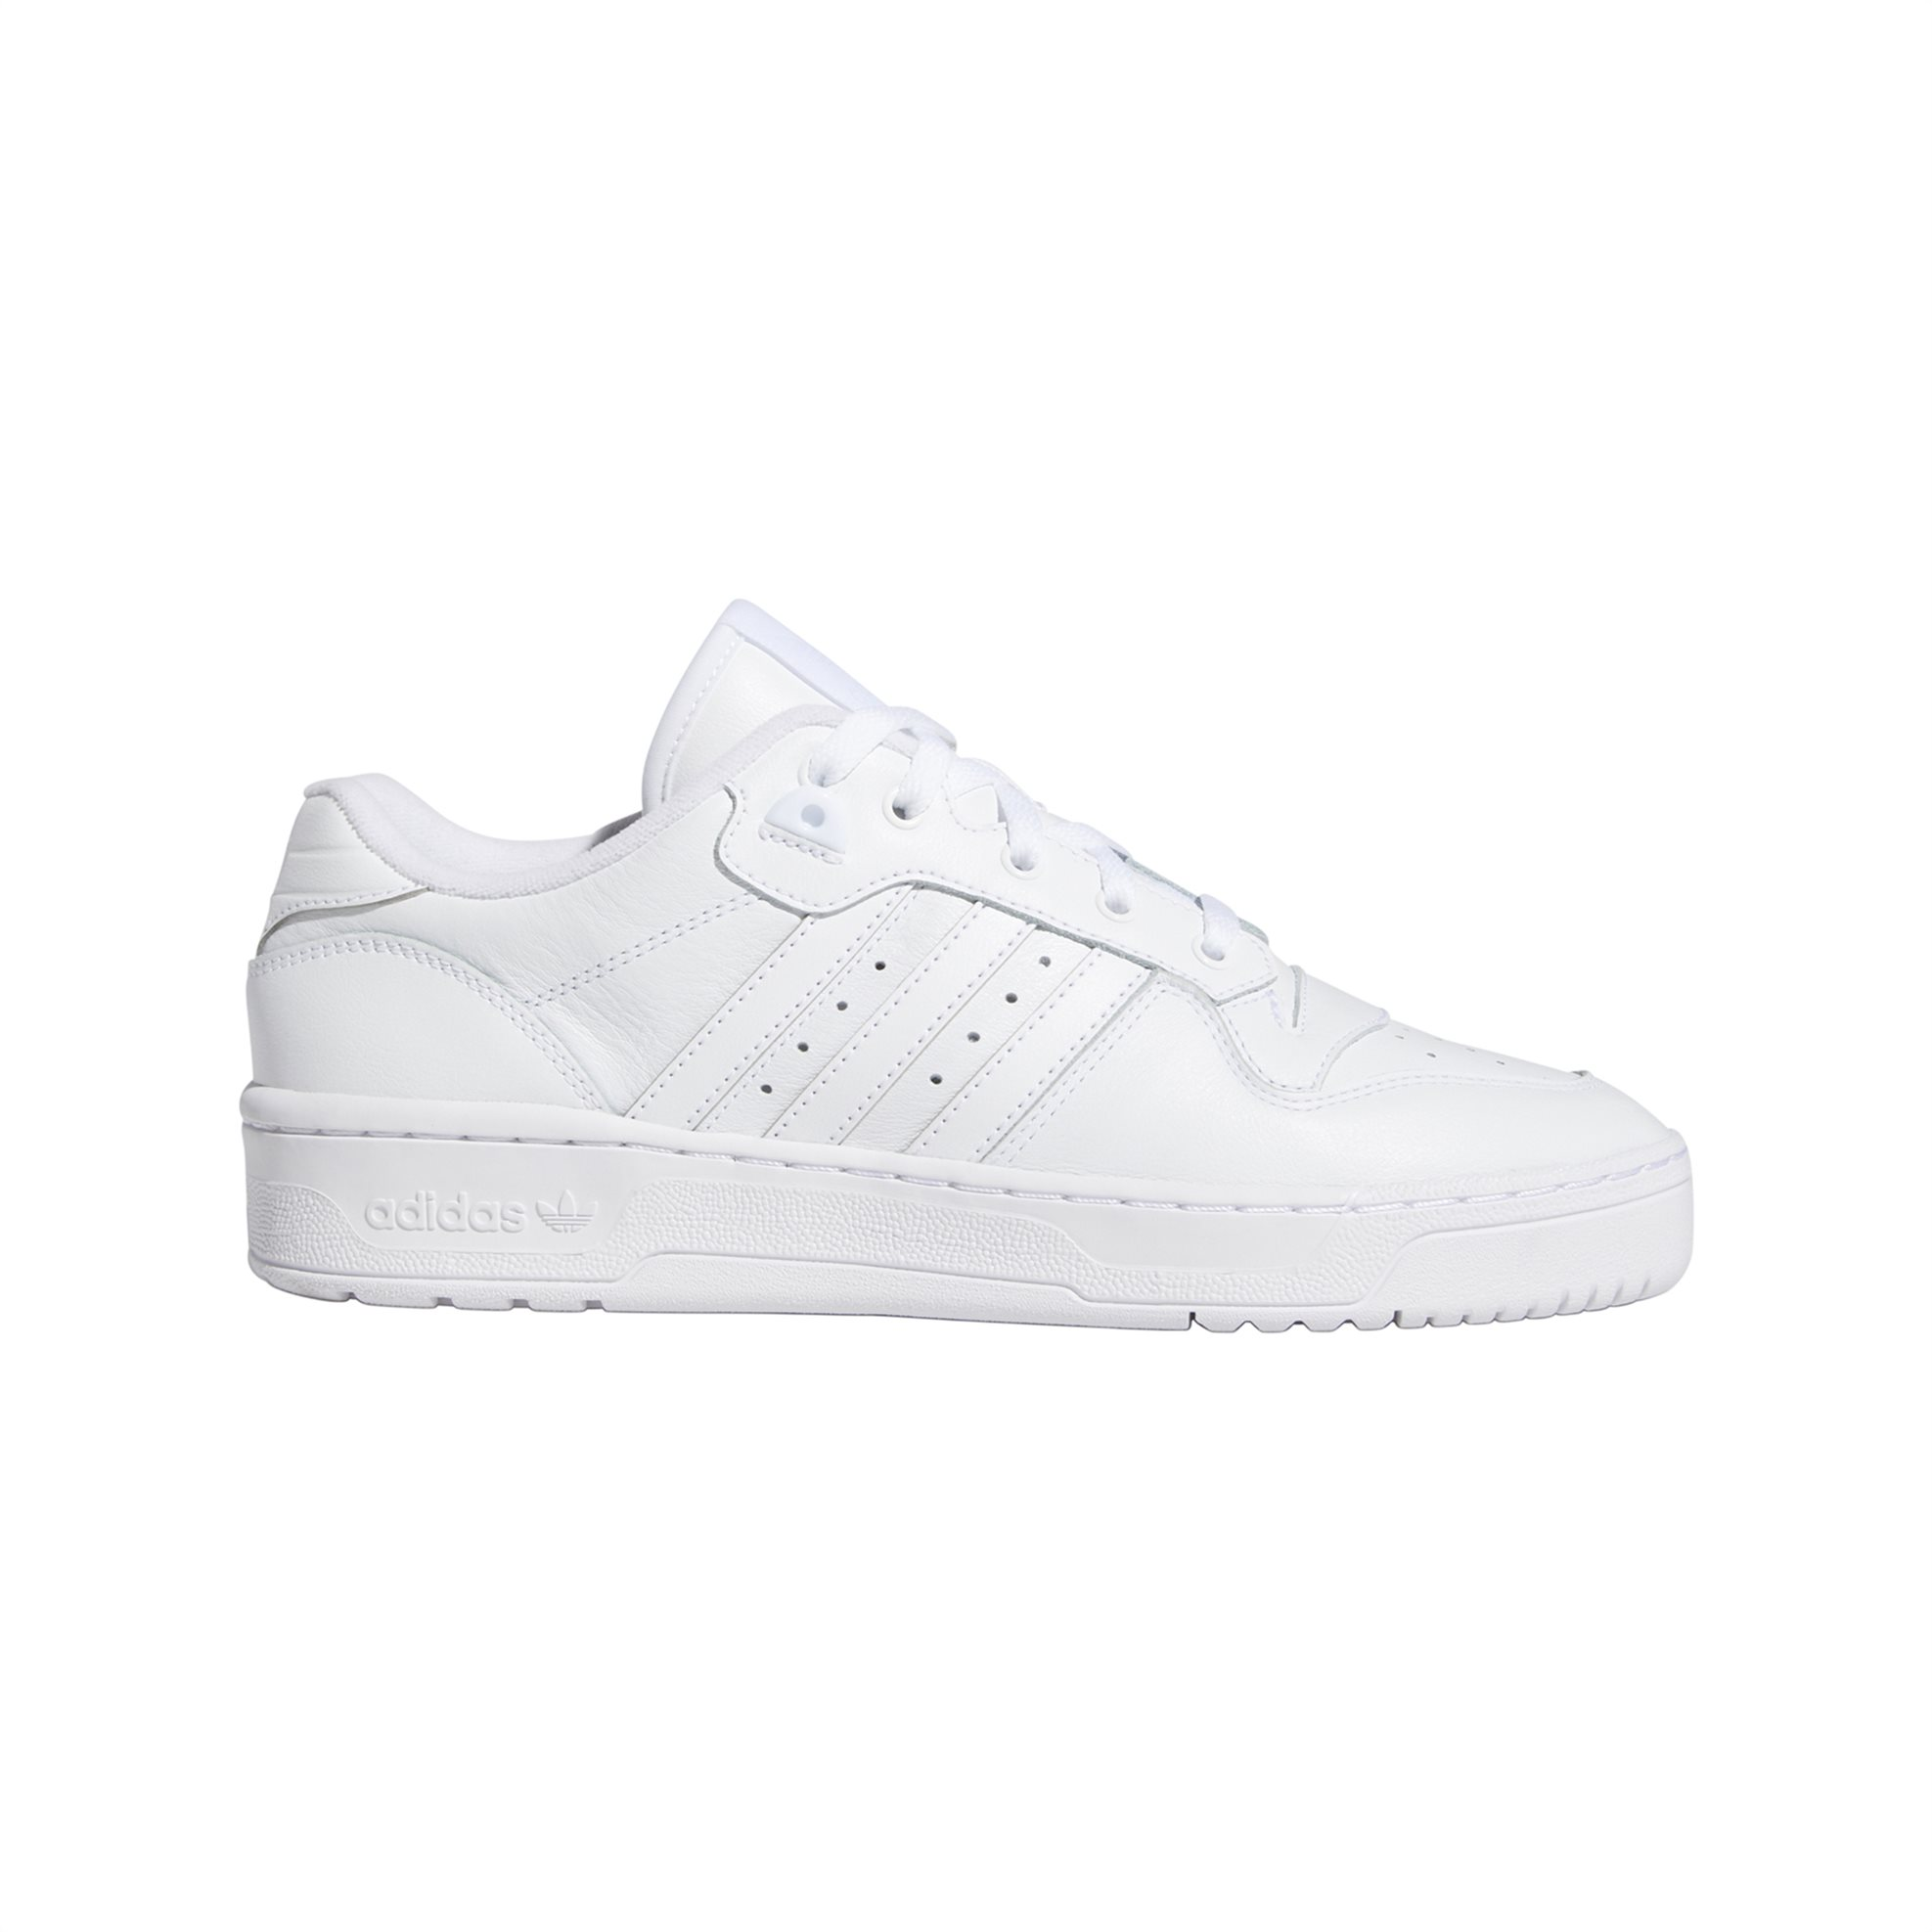 Adidas ανδρικά sneakers μονόχρωμα ''Rivalry Low'' - EF8729 - Λευκό